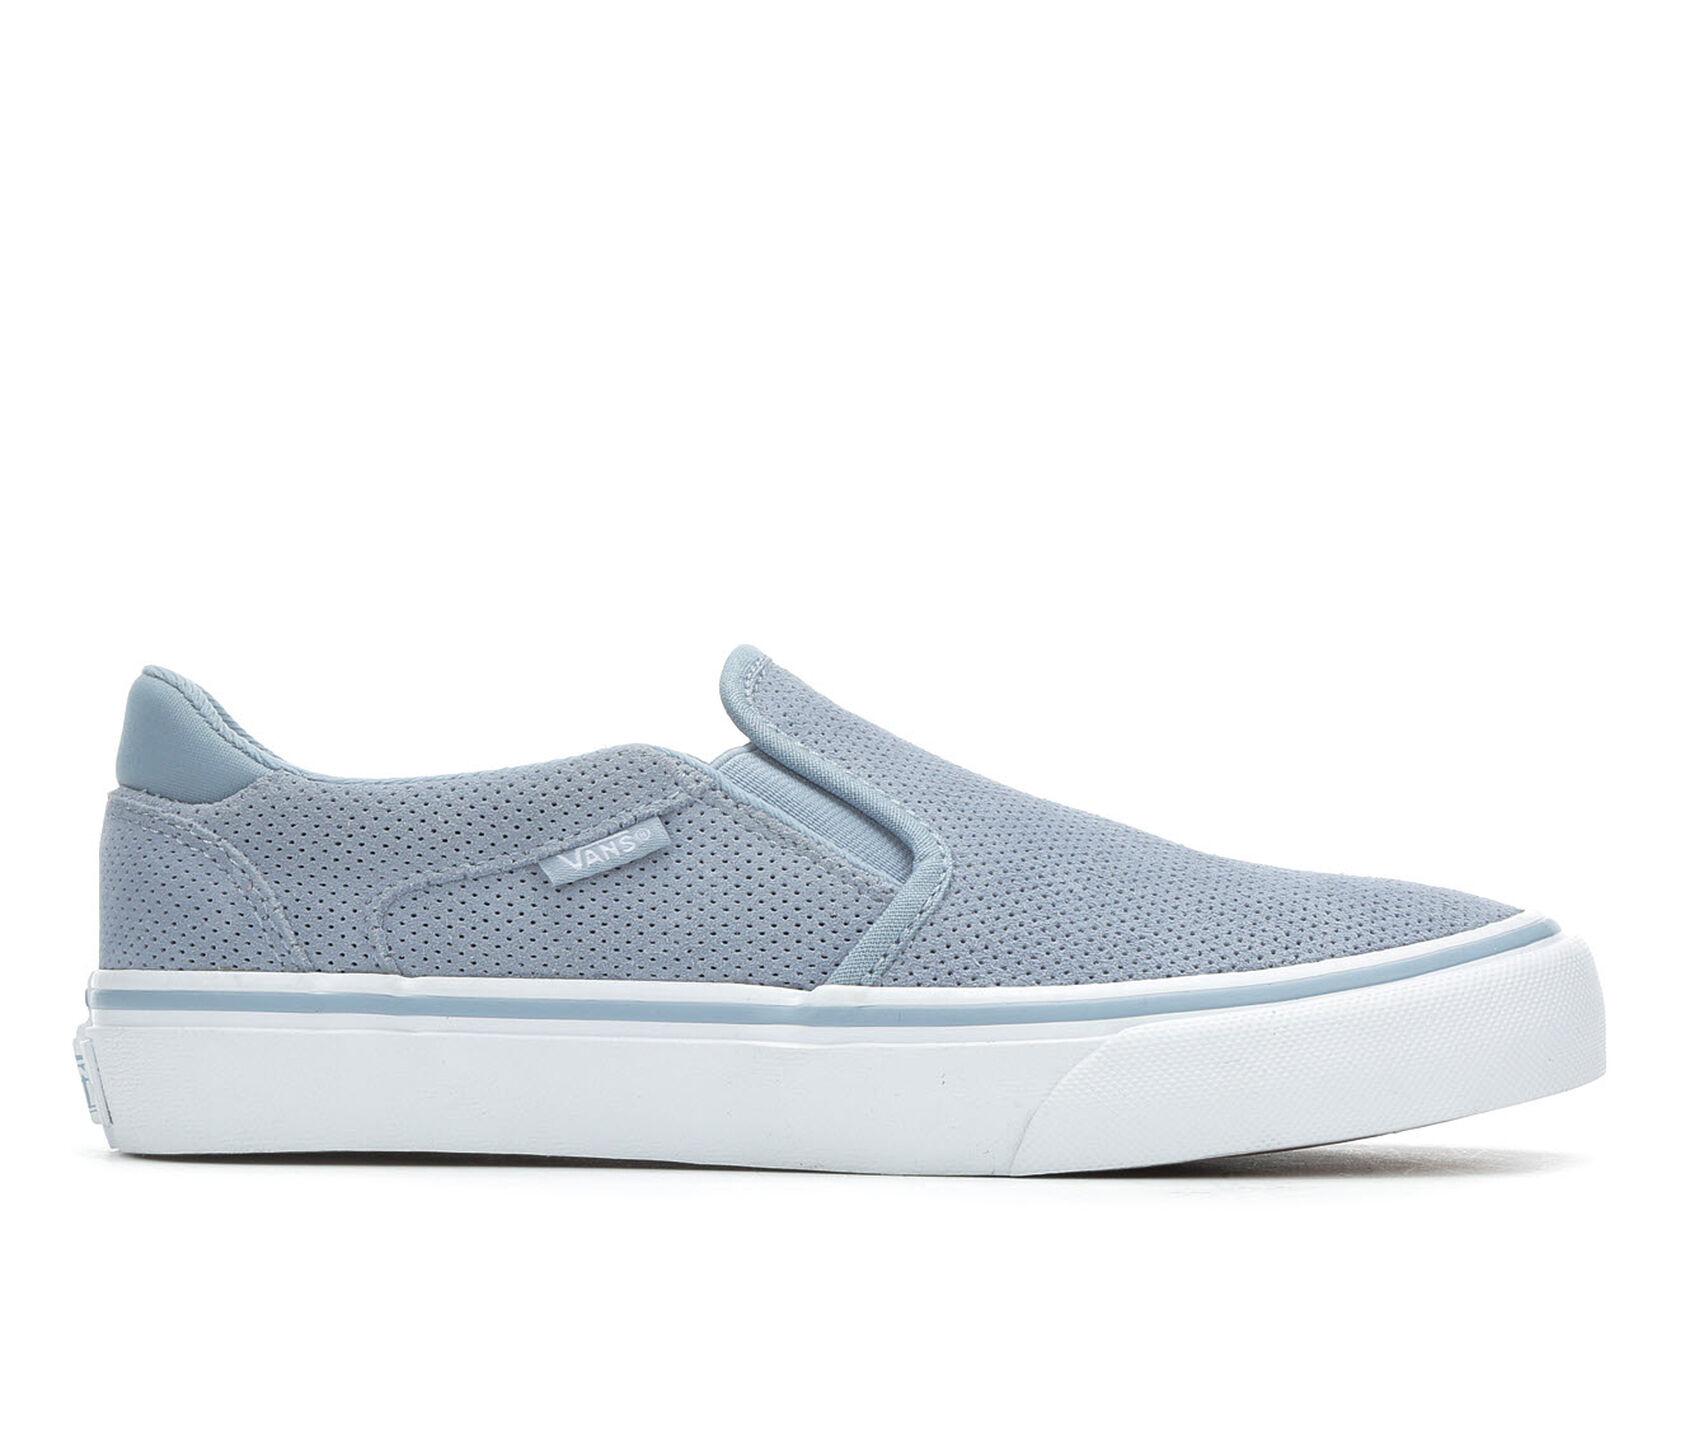 4d67451291ee Women's Vans Asher Deluxe Skate Shoes | Shoe Carnival